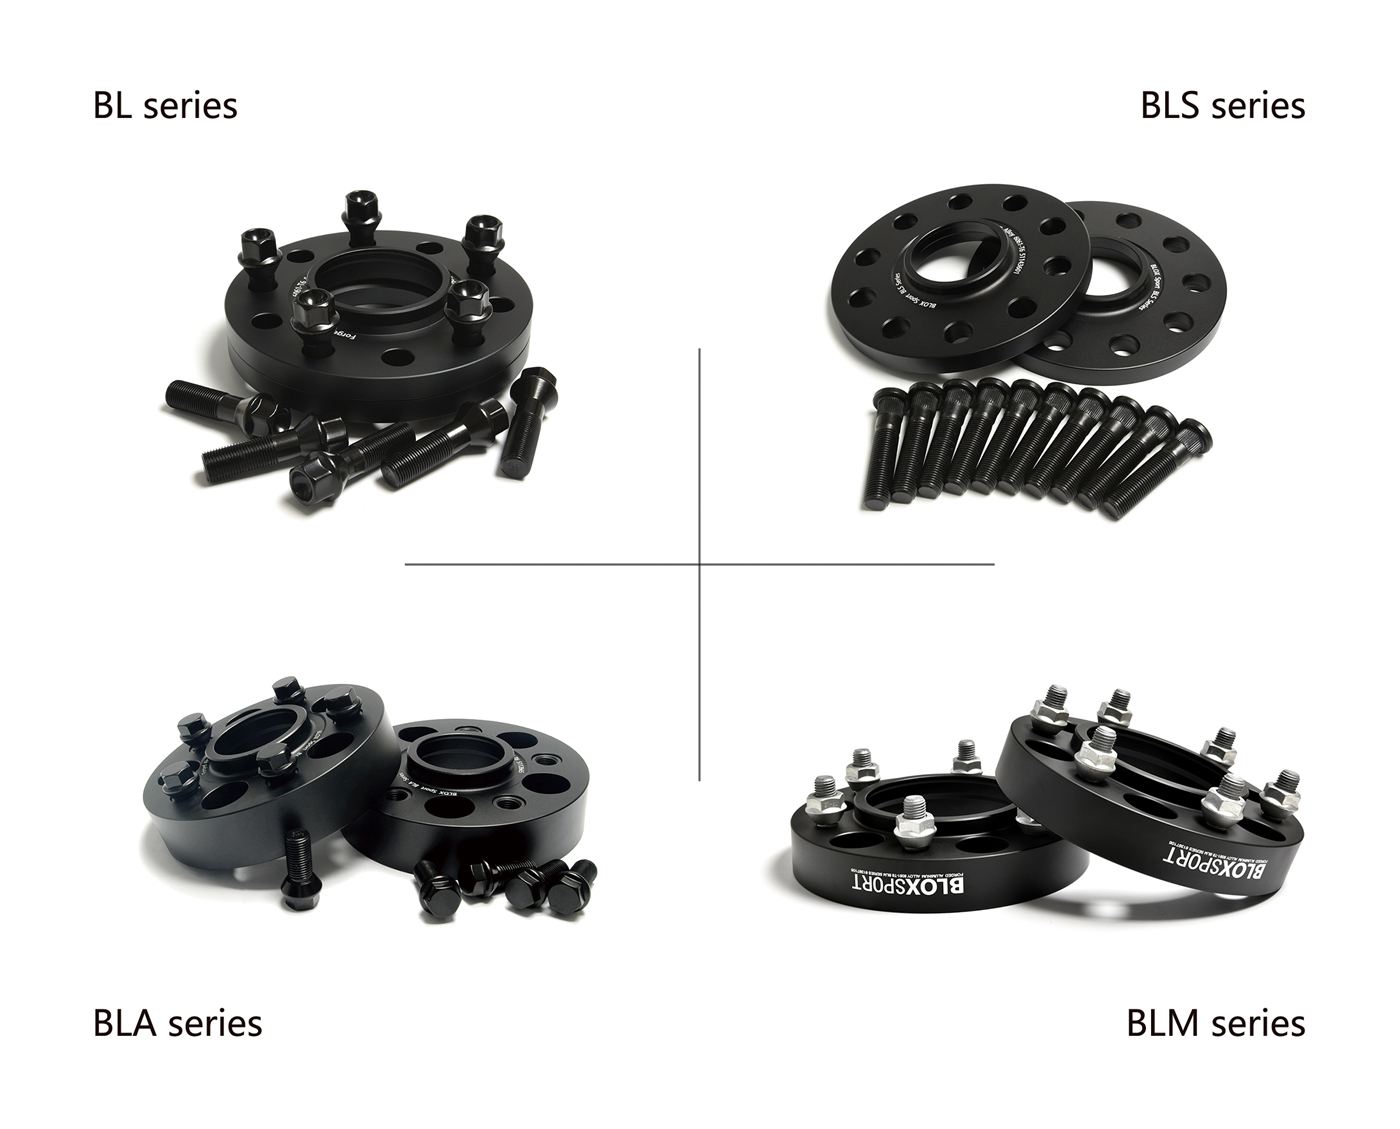 4x10mm 5x114.3 wheel spacers CB67.1 for Mazda Axela Atenza CX5 CX7 MX6 RX7 RX8